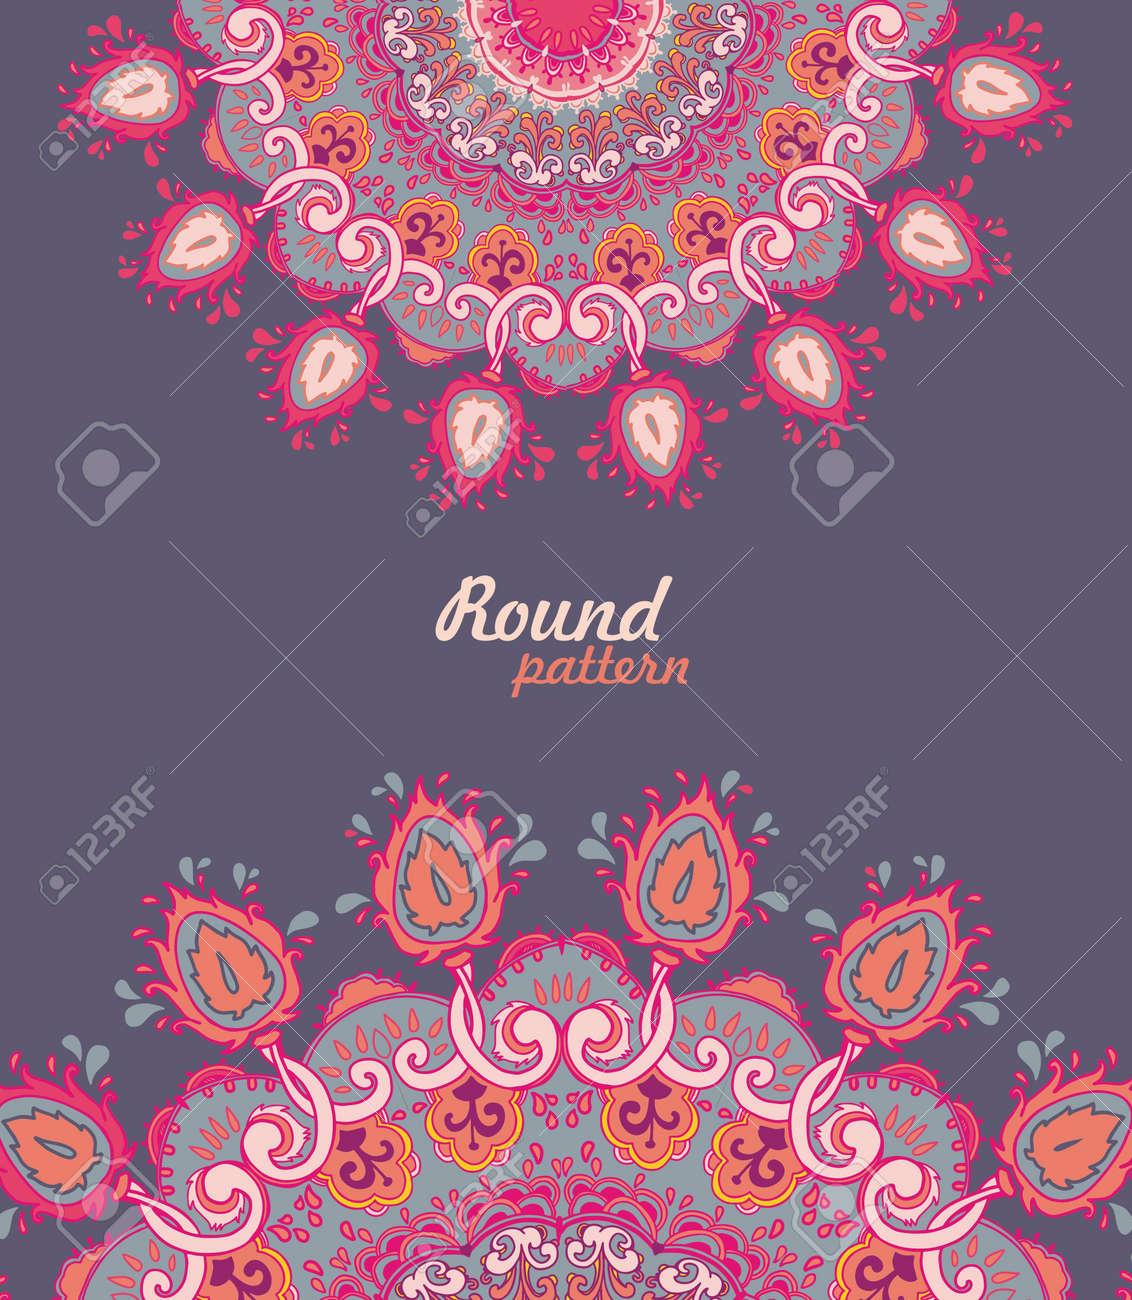 Ornamental round floral lace pattern. kaleidoscopic floral pattern, mandala. - 14959799